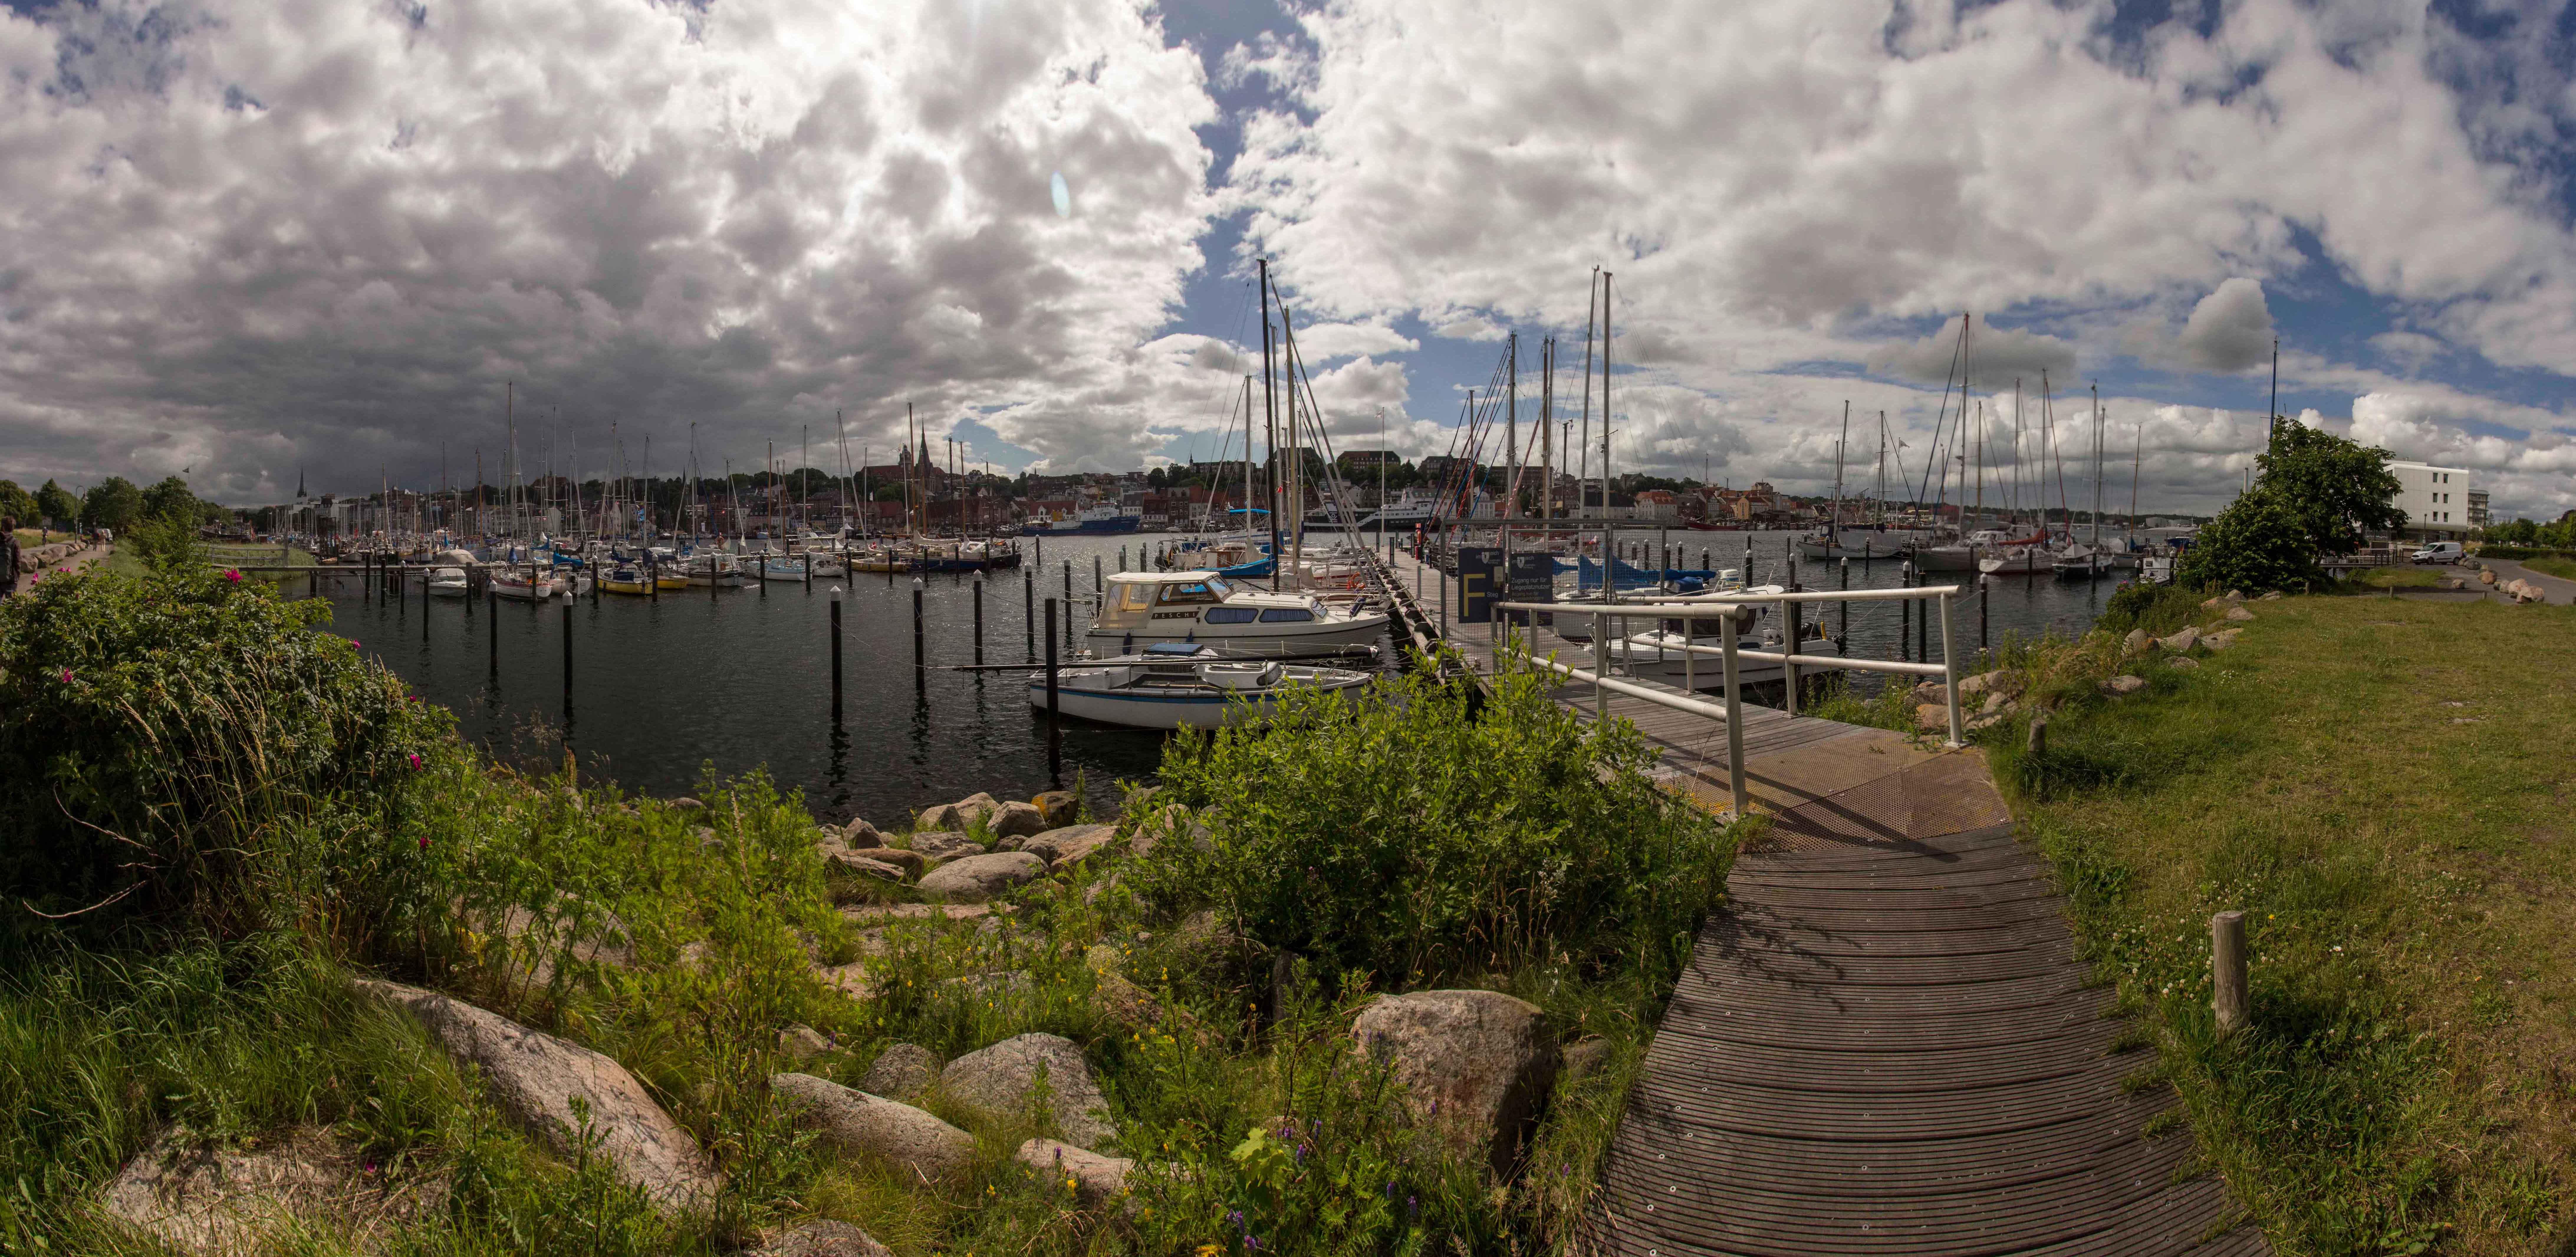 Panorama vom Yachthafen